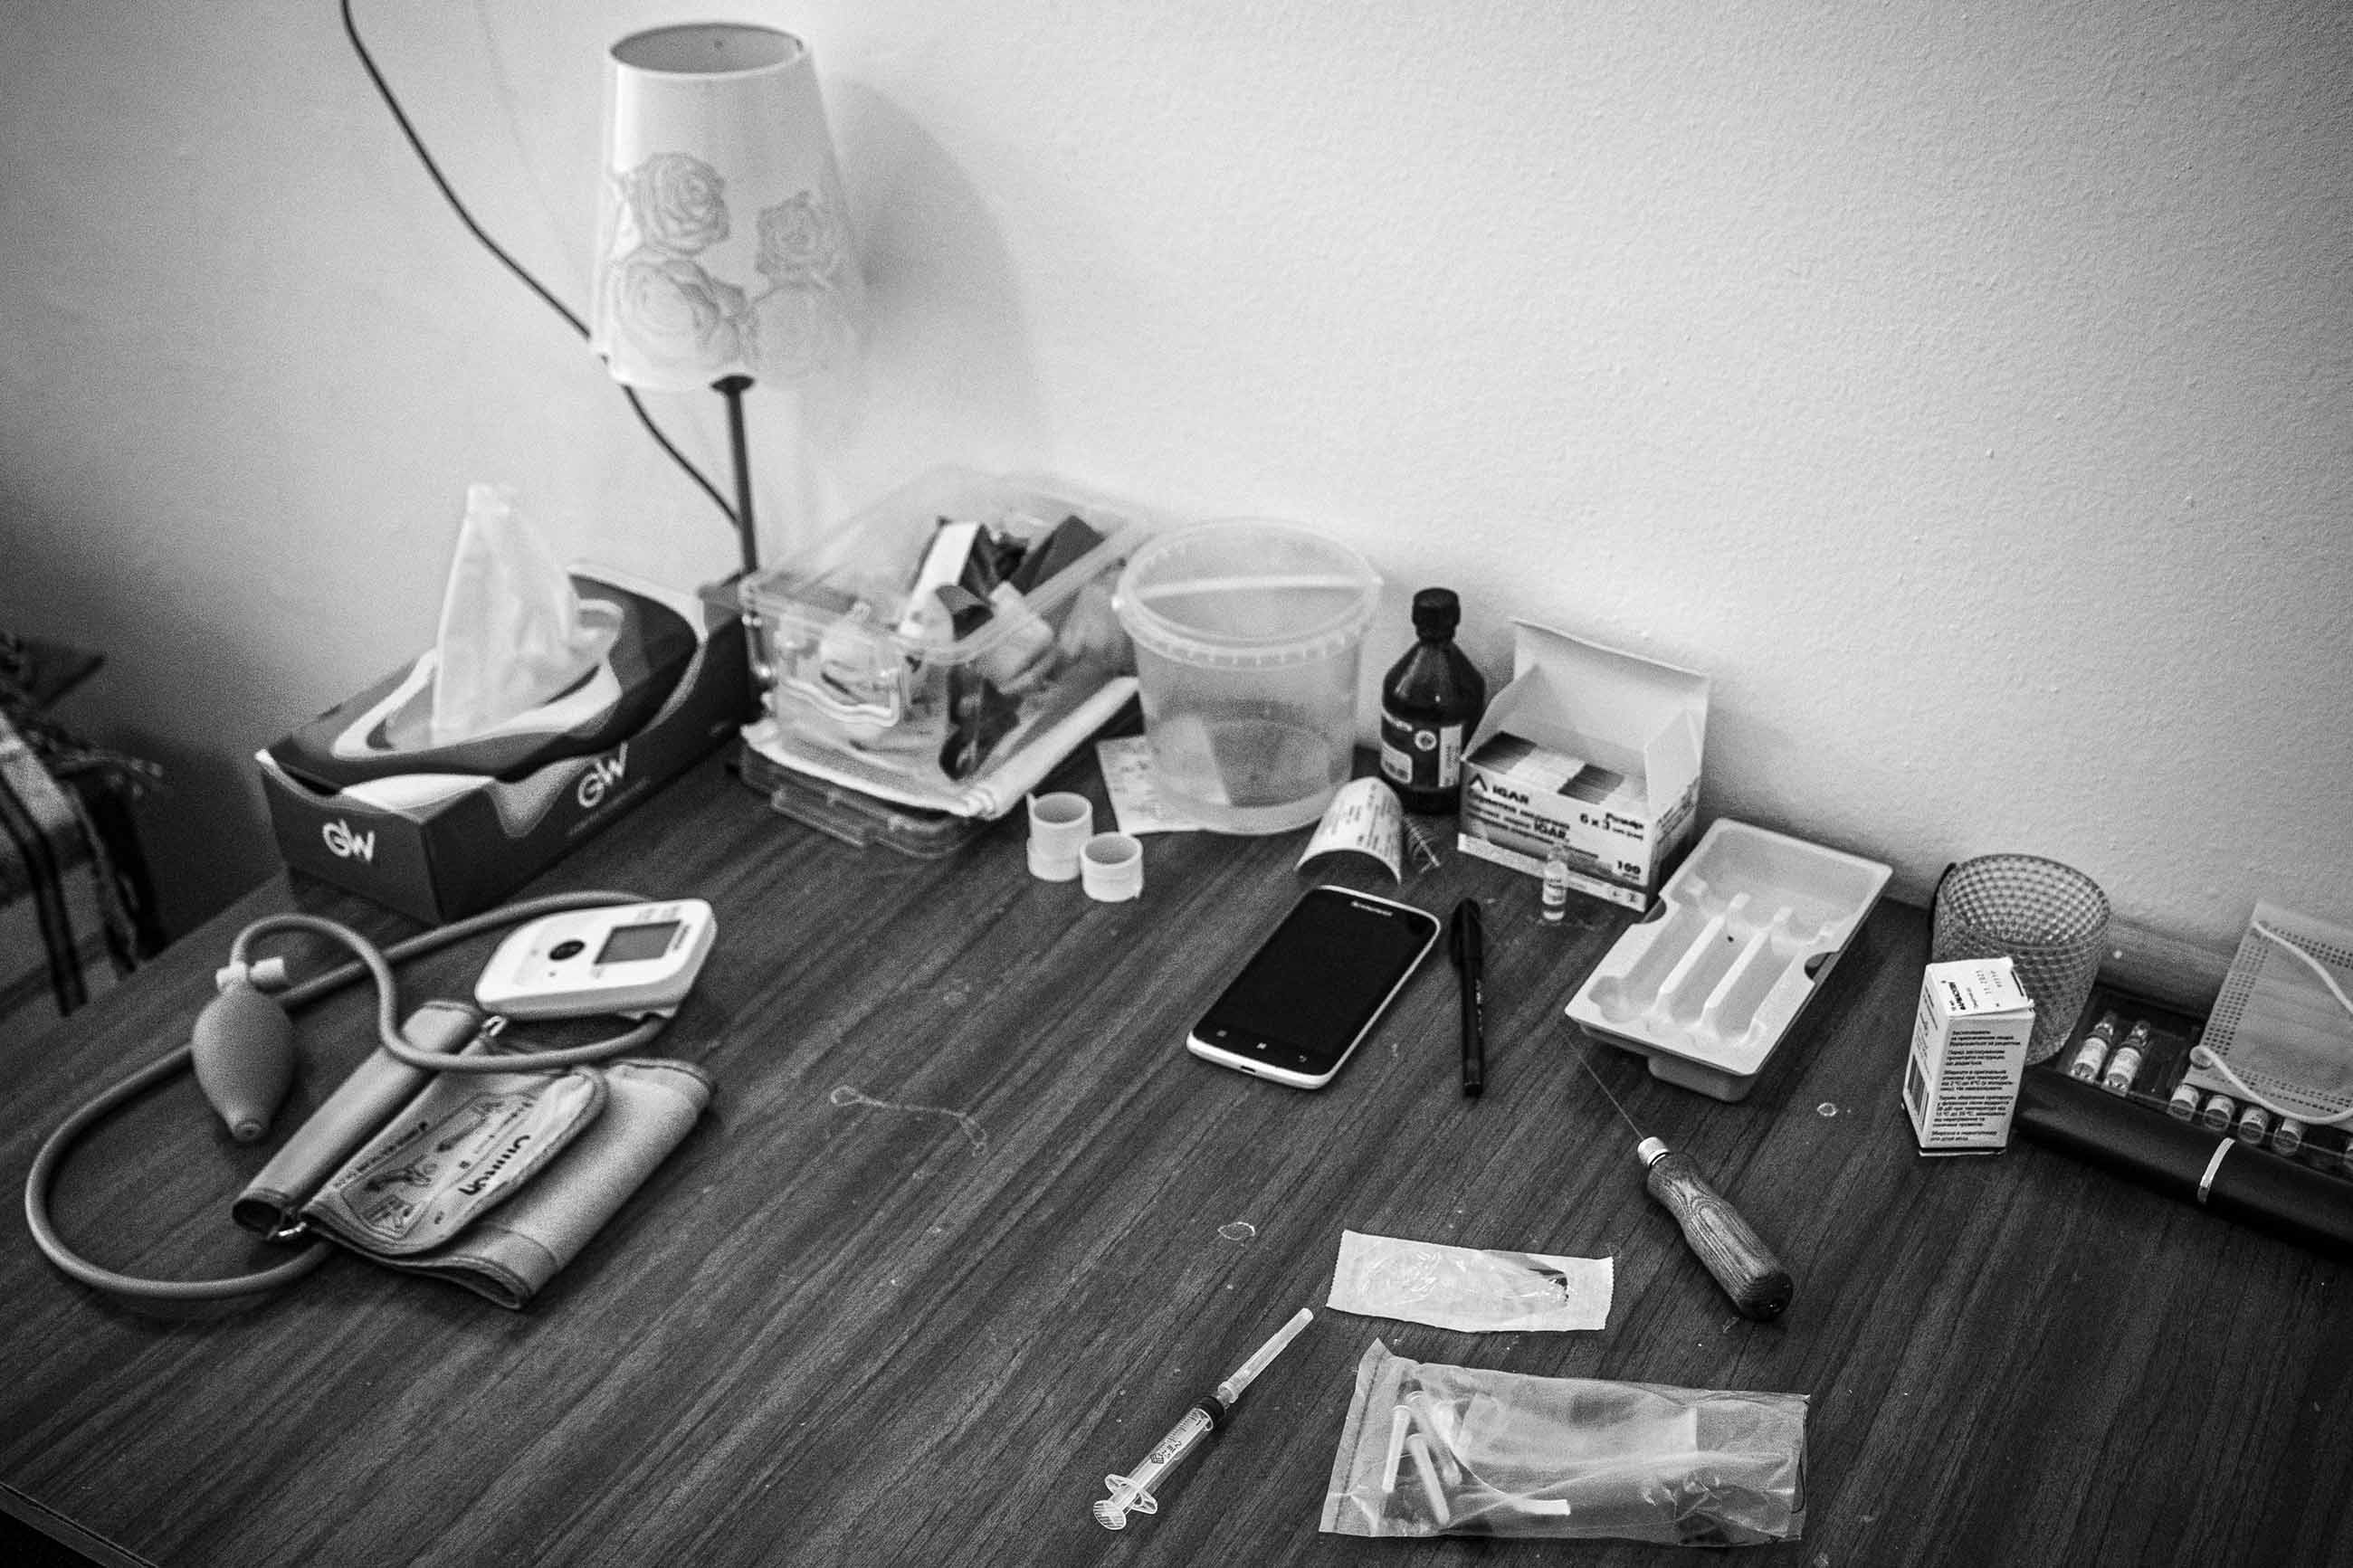 ketamine dsc03200 - <b>From Party Drug to Medicine:</b> How Ketamine is Used to Treat Depression in Ukraine - Заборона